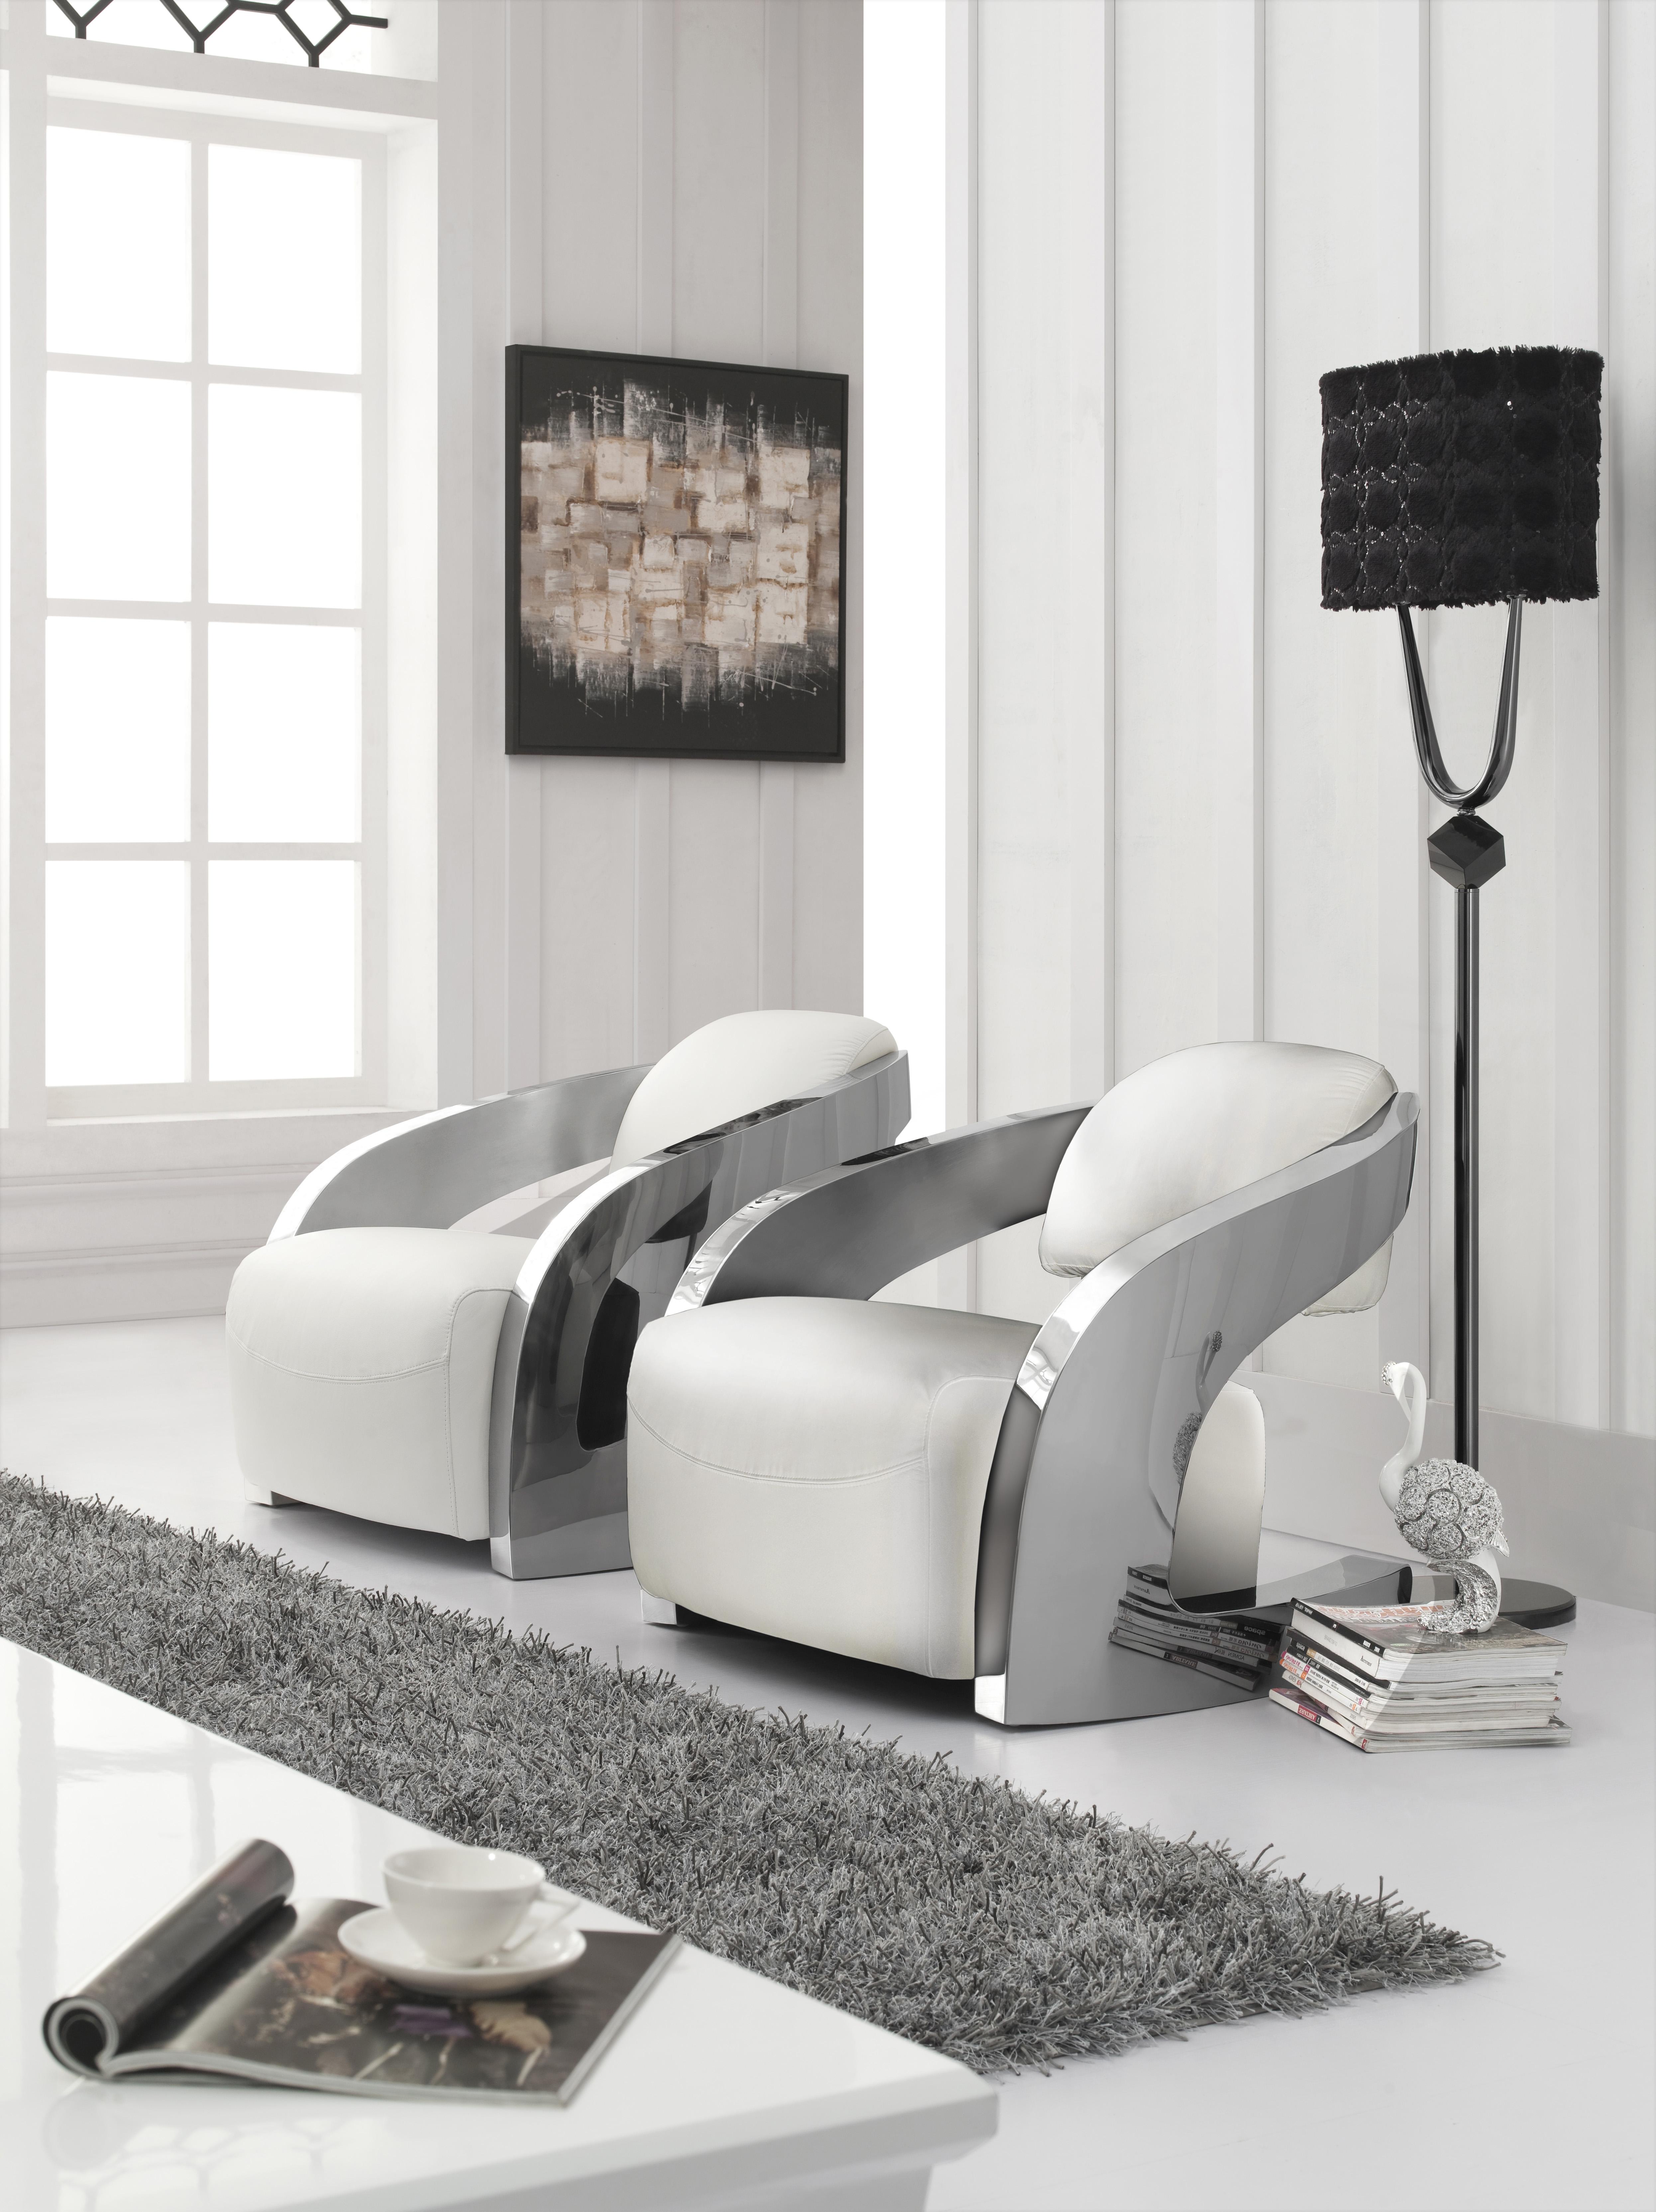 Detalles elegantes para tu casa villalba interiorismo - Villalba interiorismo ...